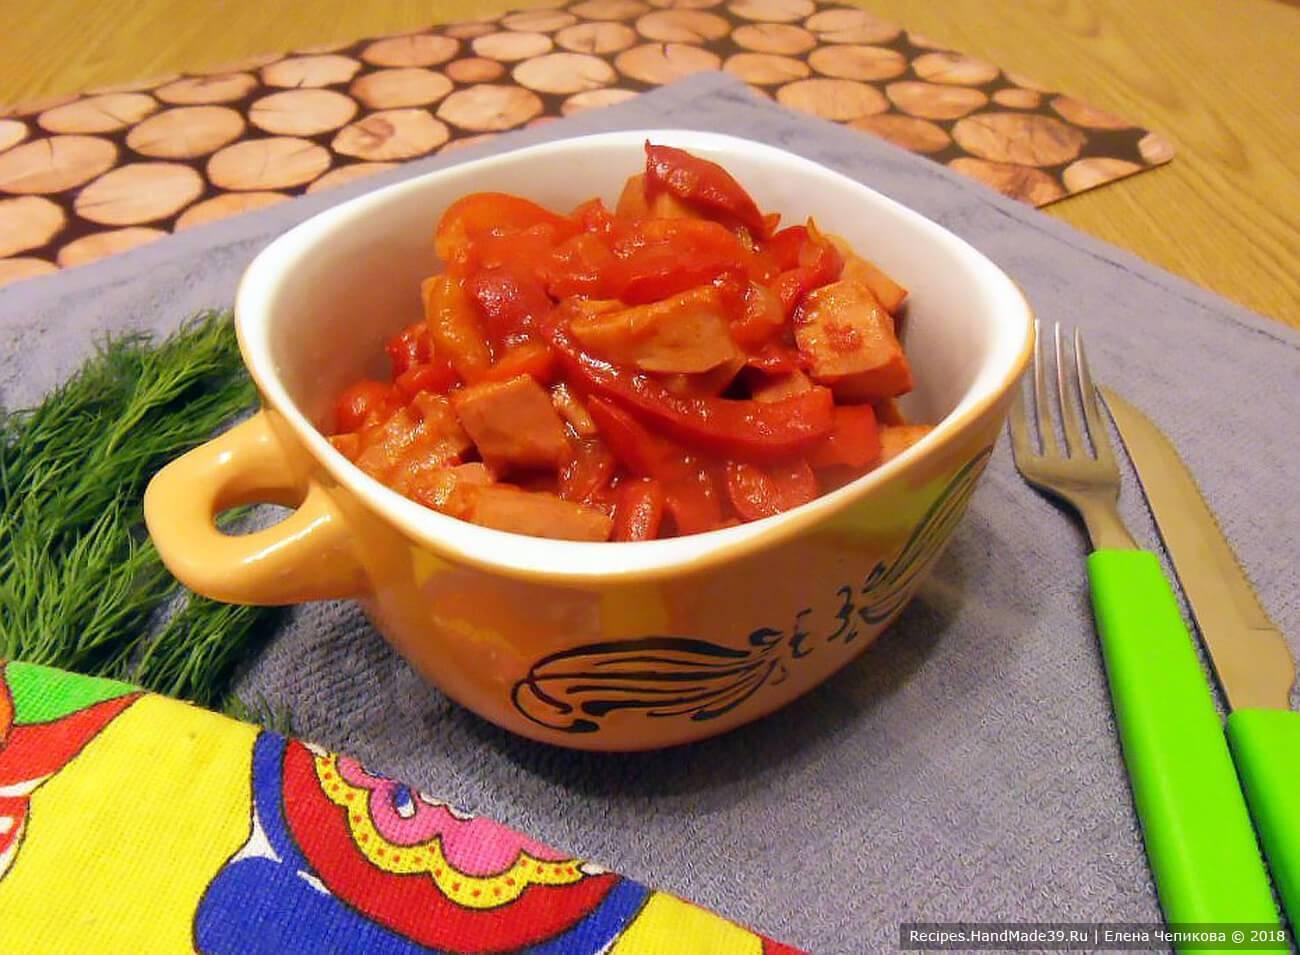 Жареная домашняя колбаса с луком